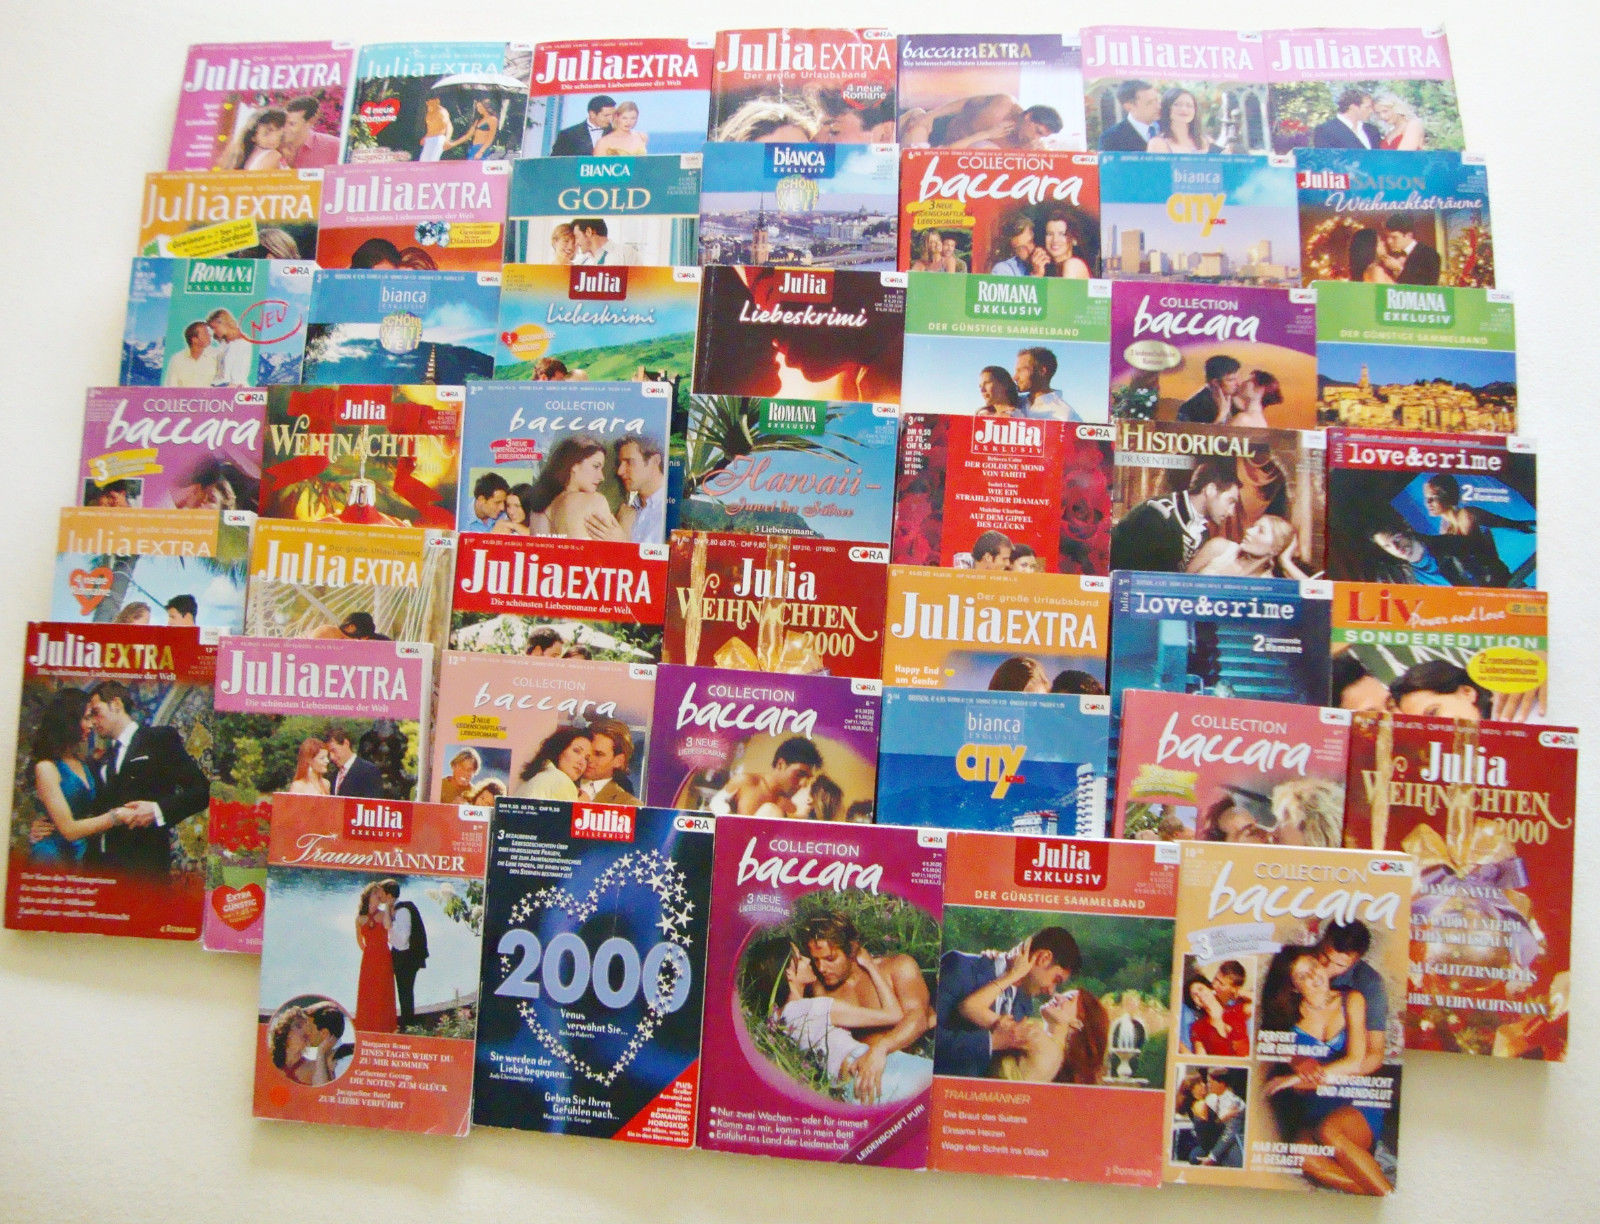 153 Romane, Julia, Baccara, Bianca, Tiffany, Romana, Cora Verlag, Frauenromane,